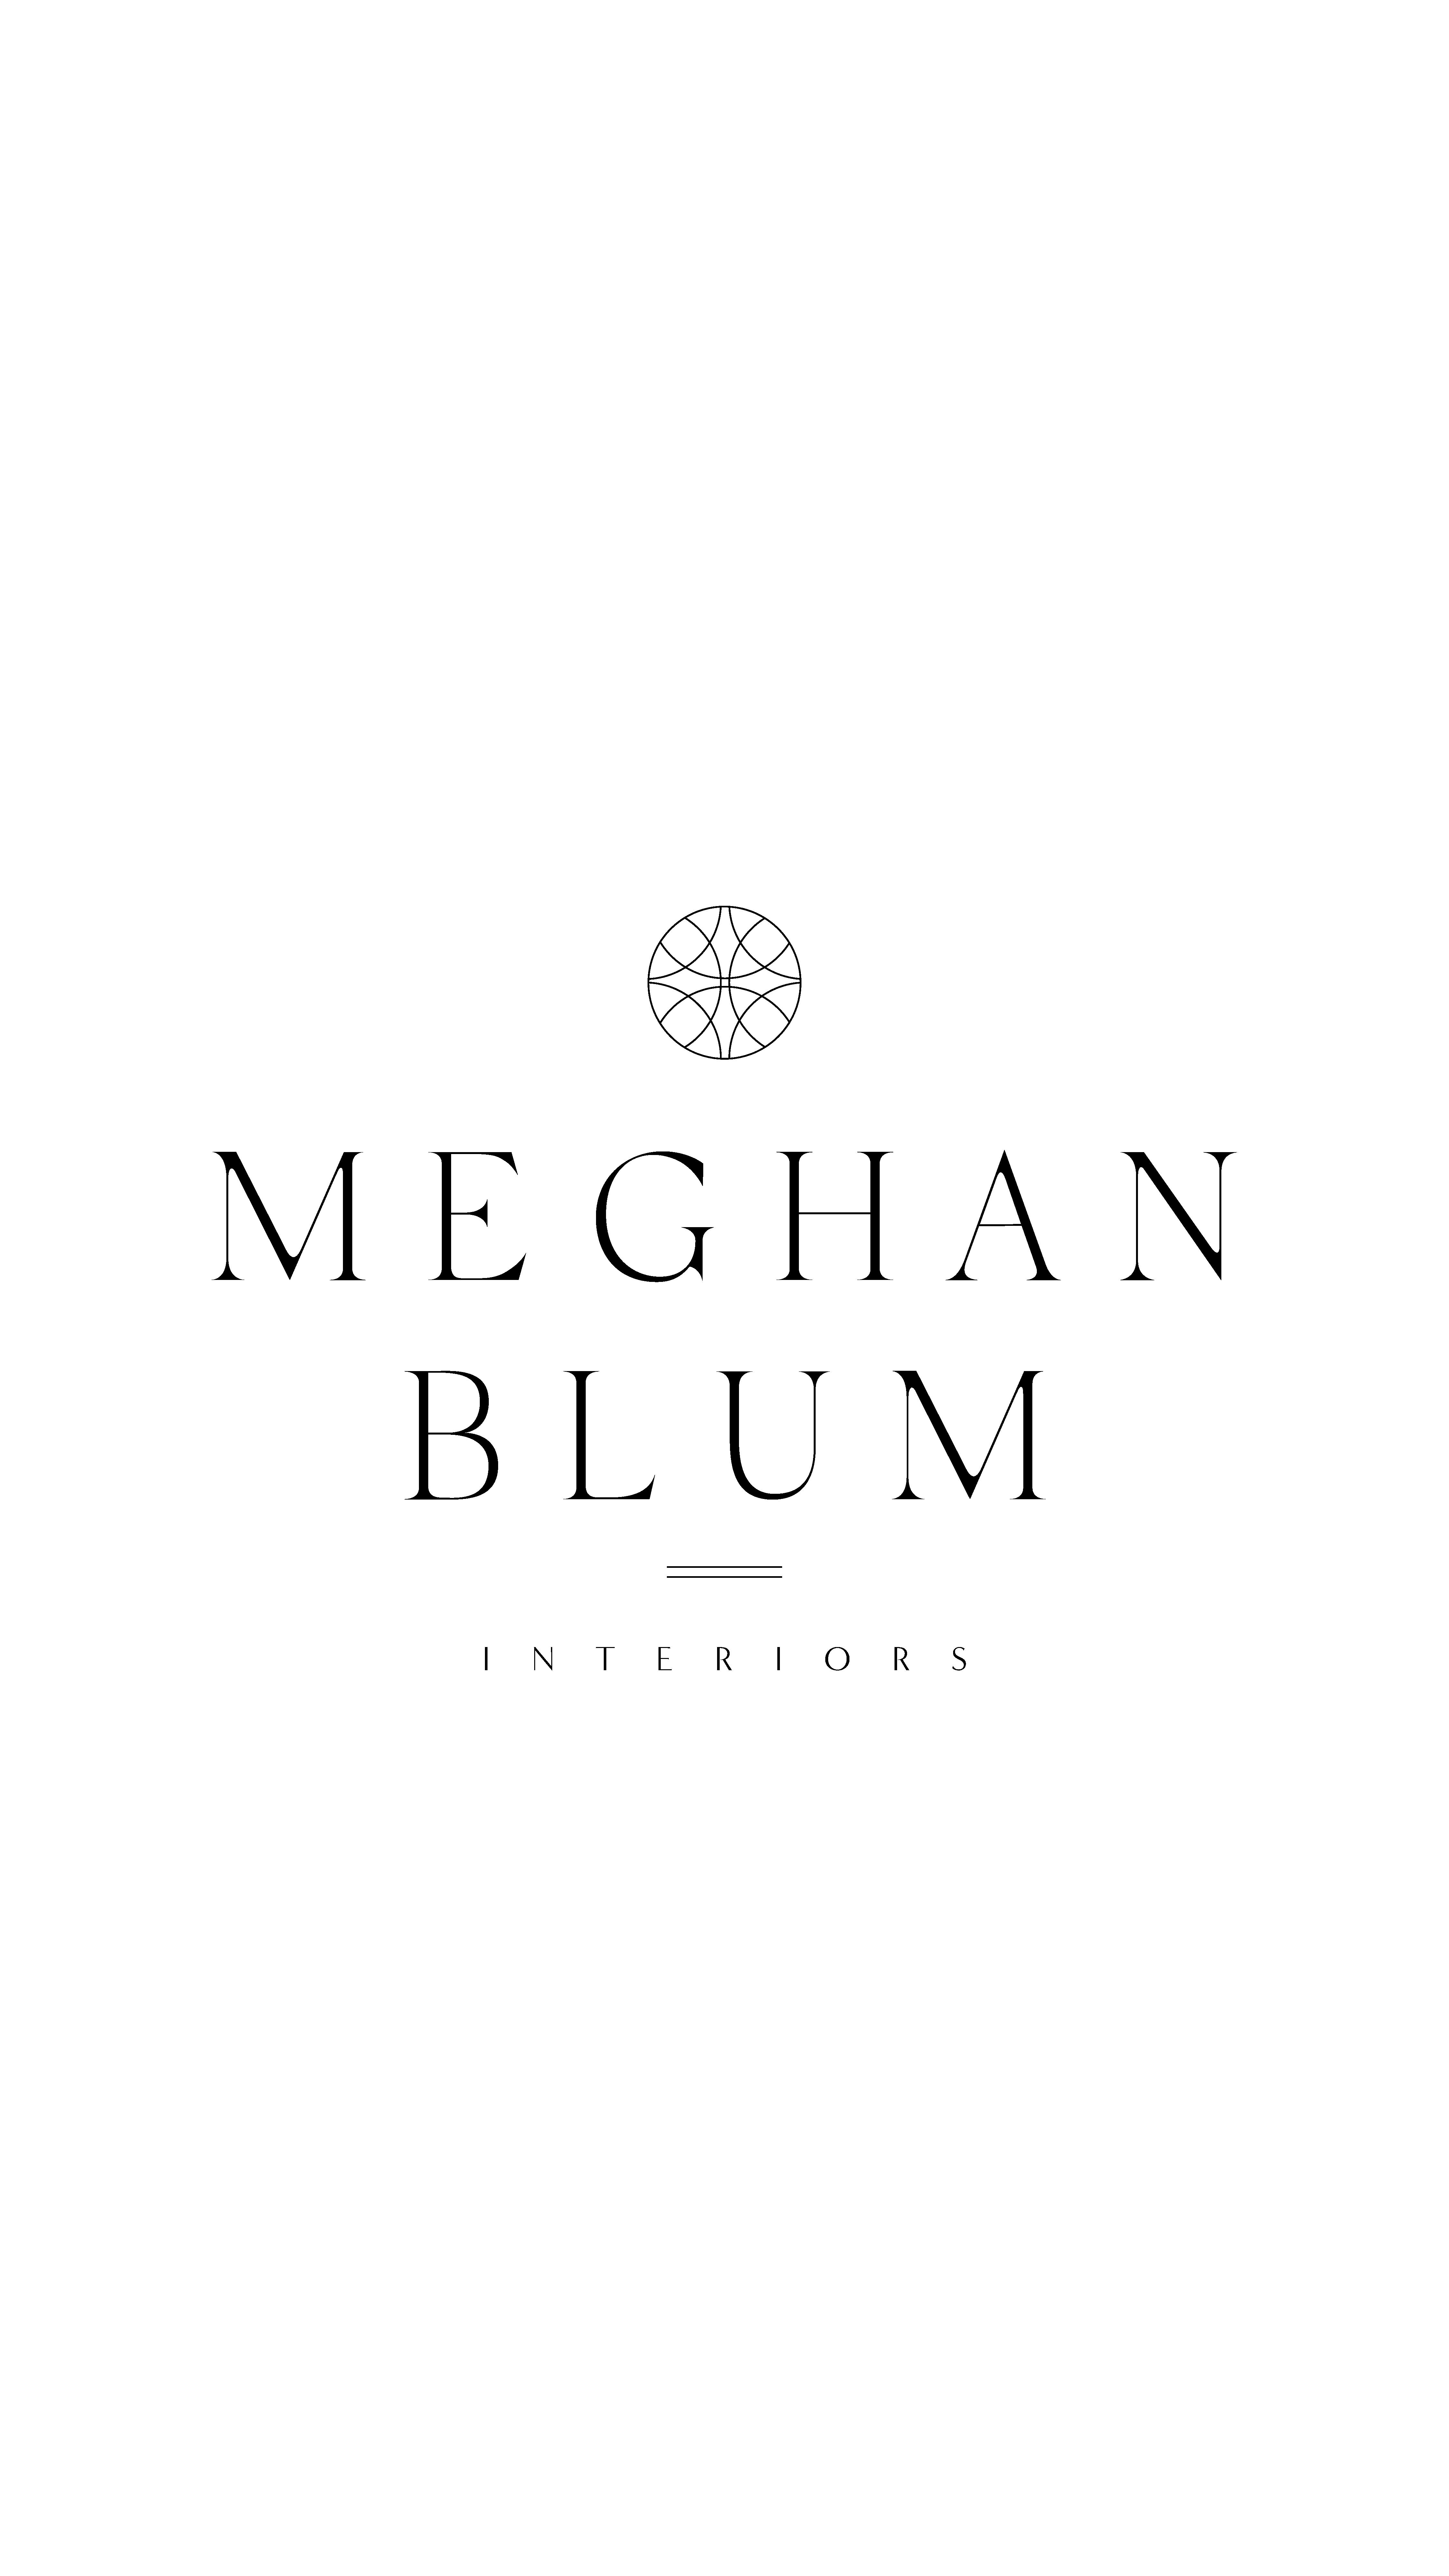 logo design and branding design for Meghan Blum Interiors